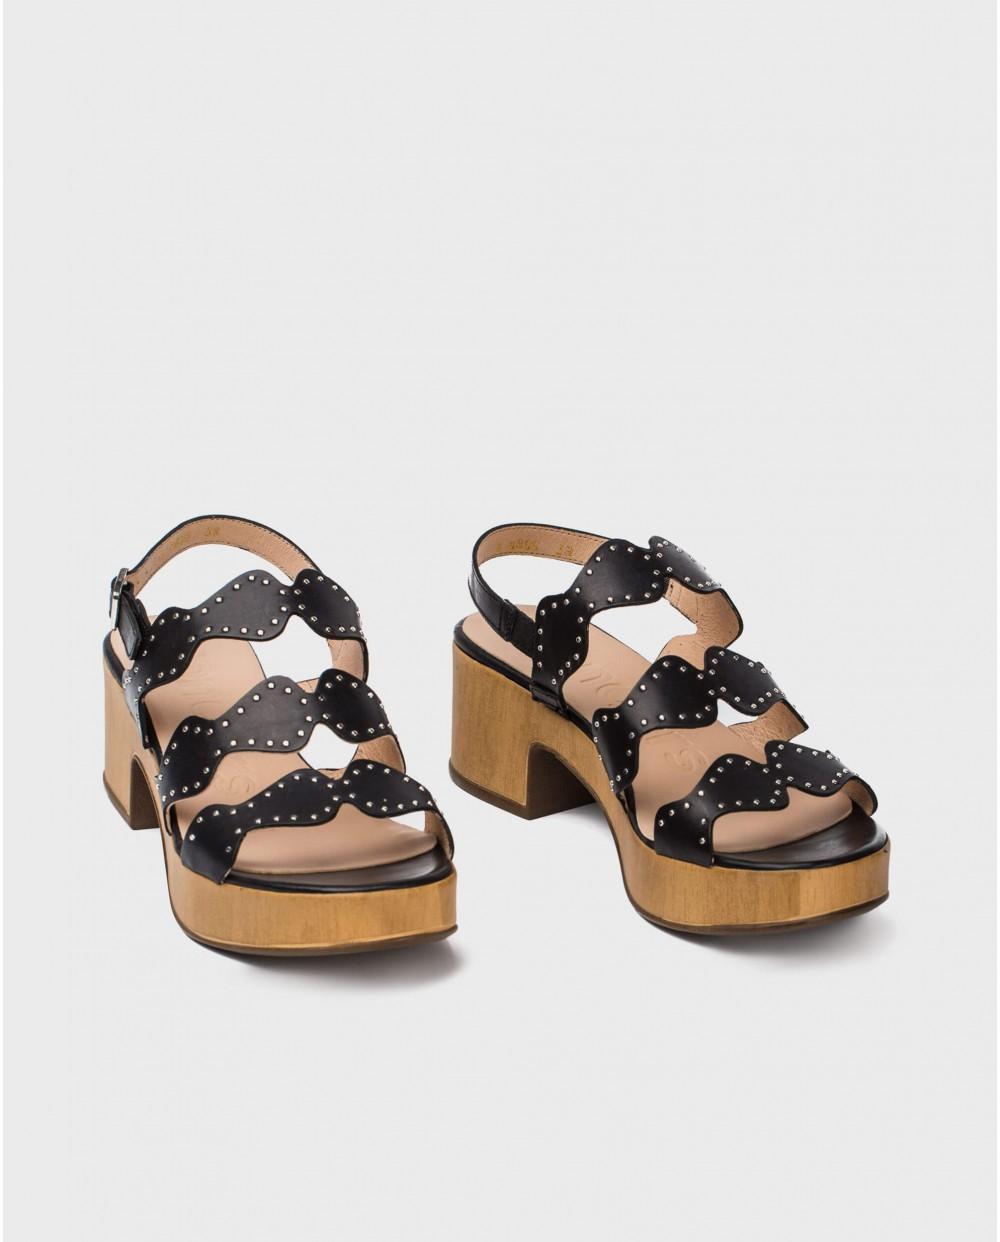 Wonders-Sandals-Sandal with metallic detail on strap